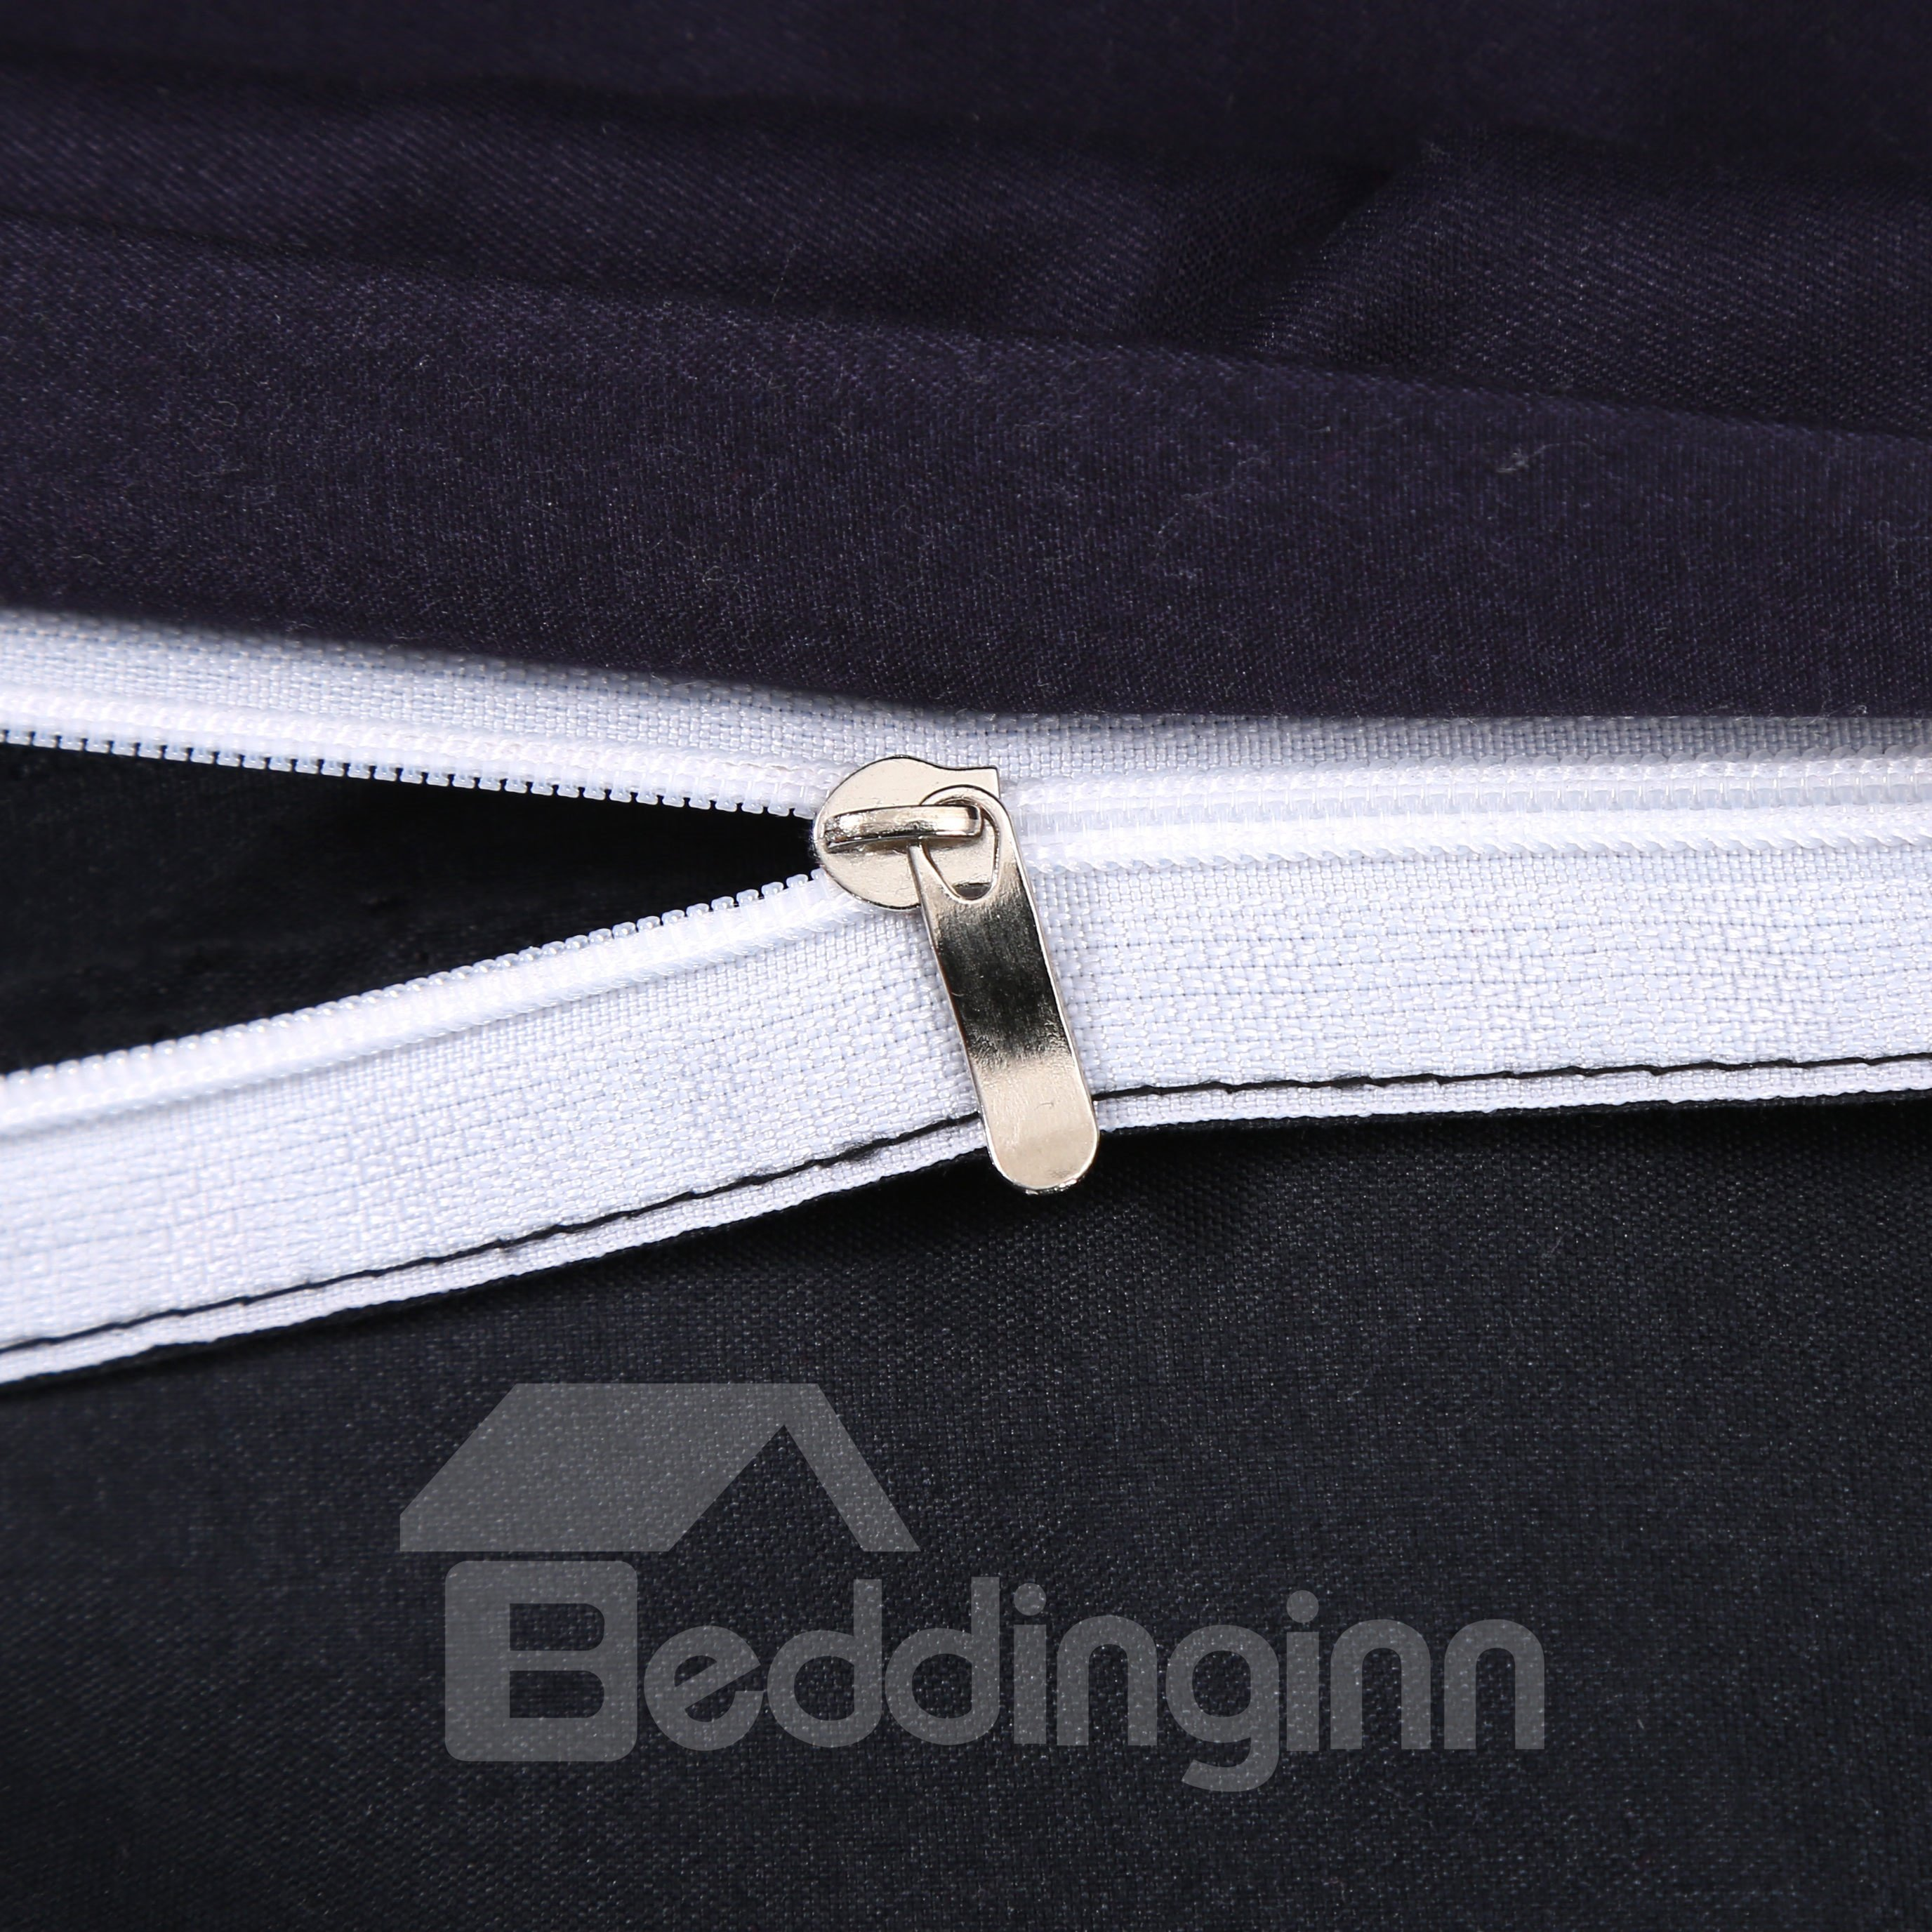 3D Wild Horse Printed Cotton 4-Piece Bedding Sets/Duvet Covers